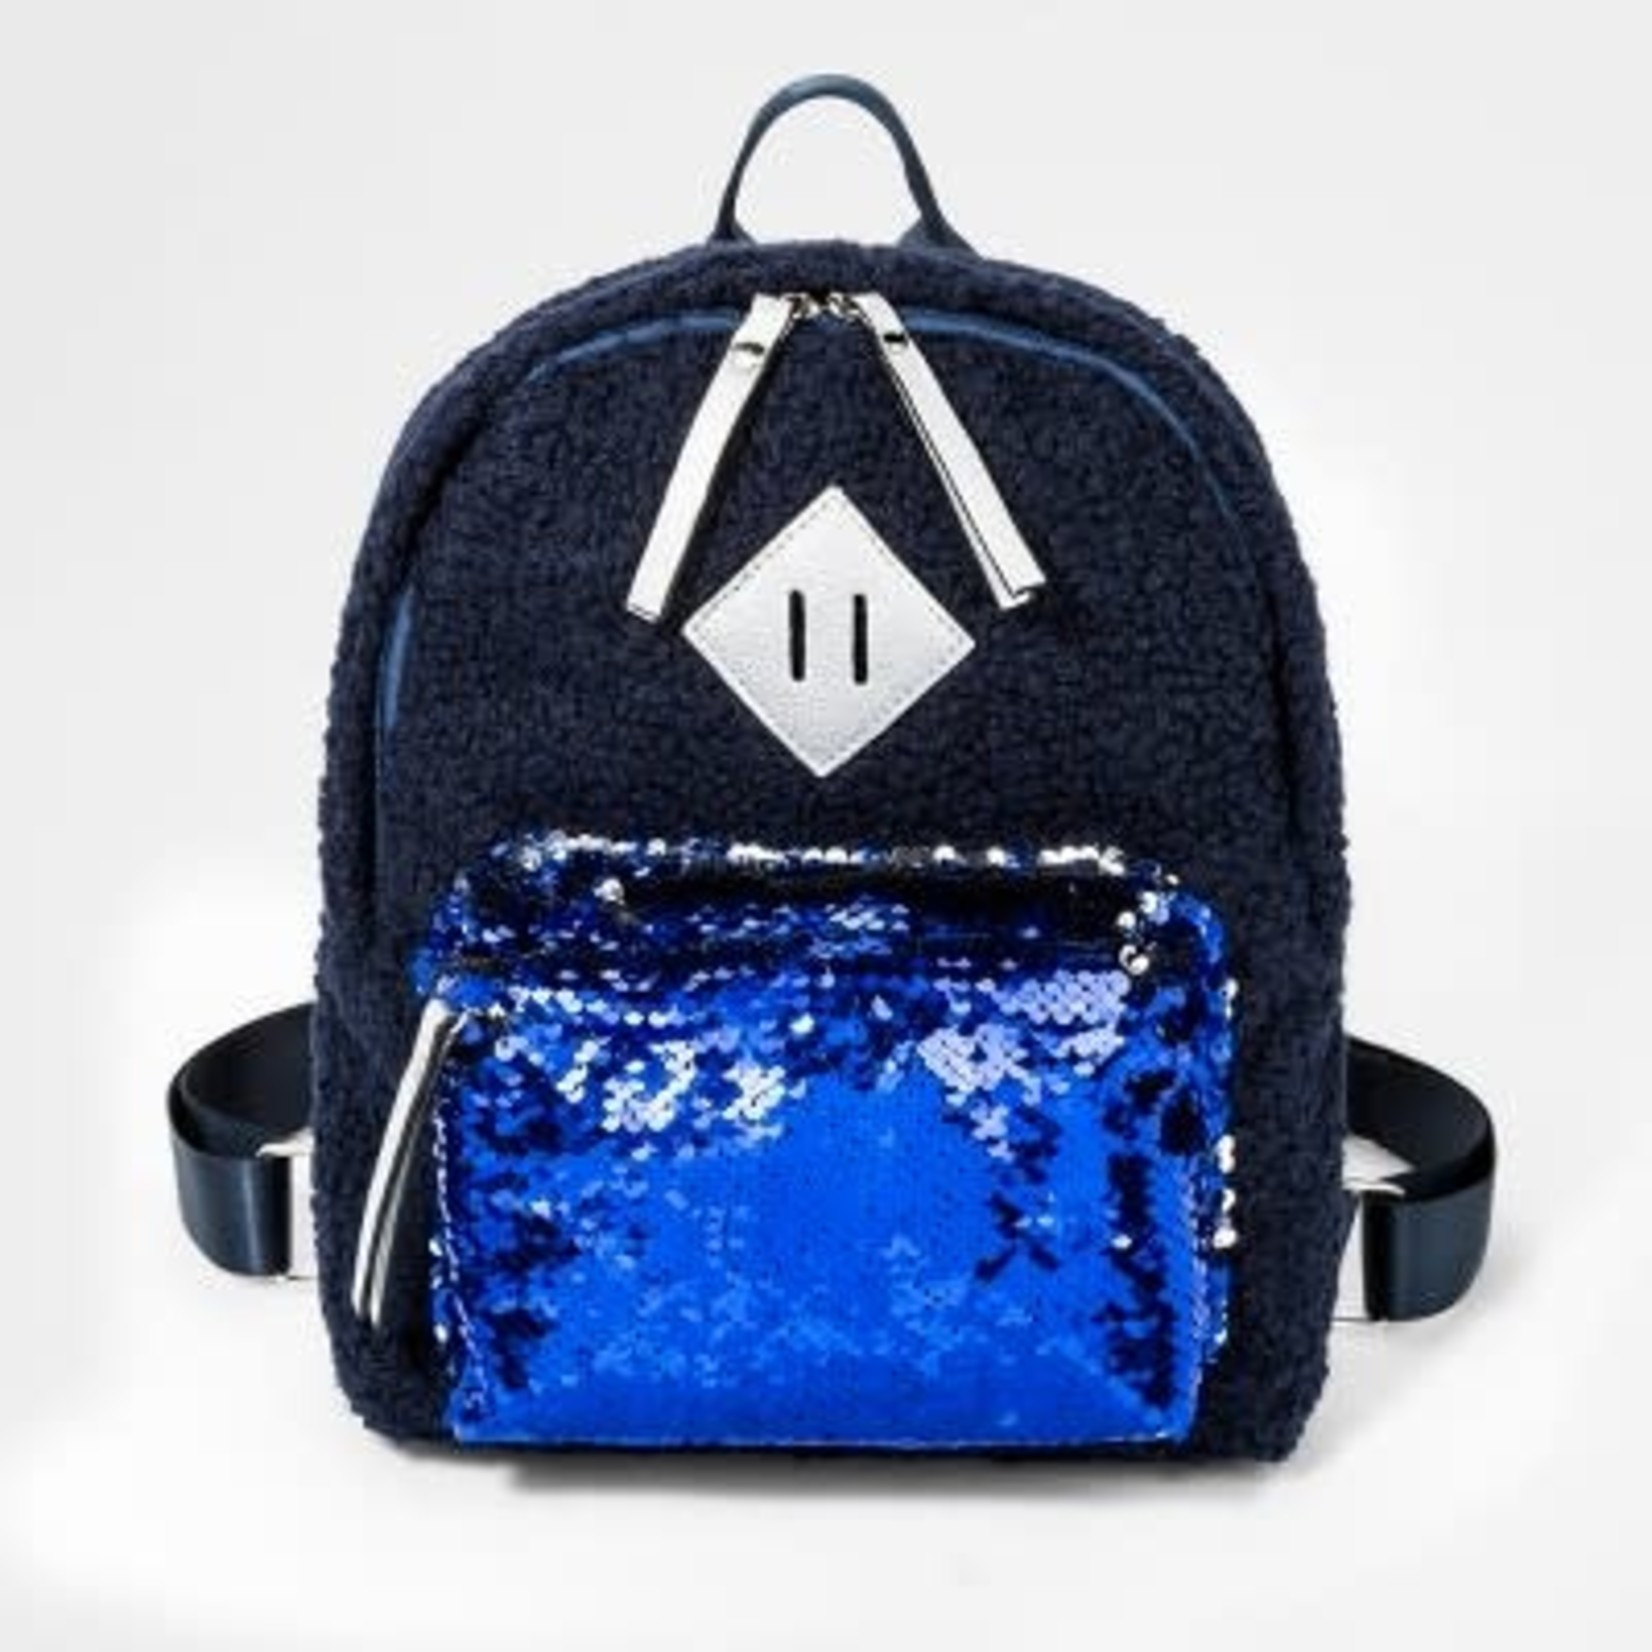 Sherpa Sequin Backpack- Cat & Jack™ Navy